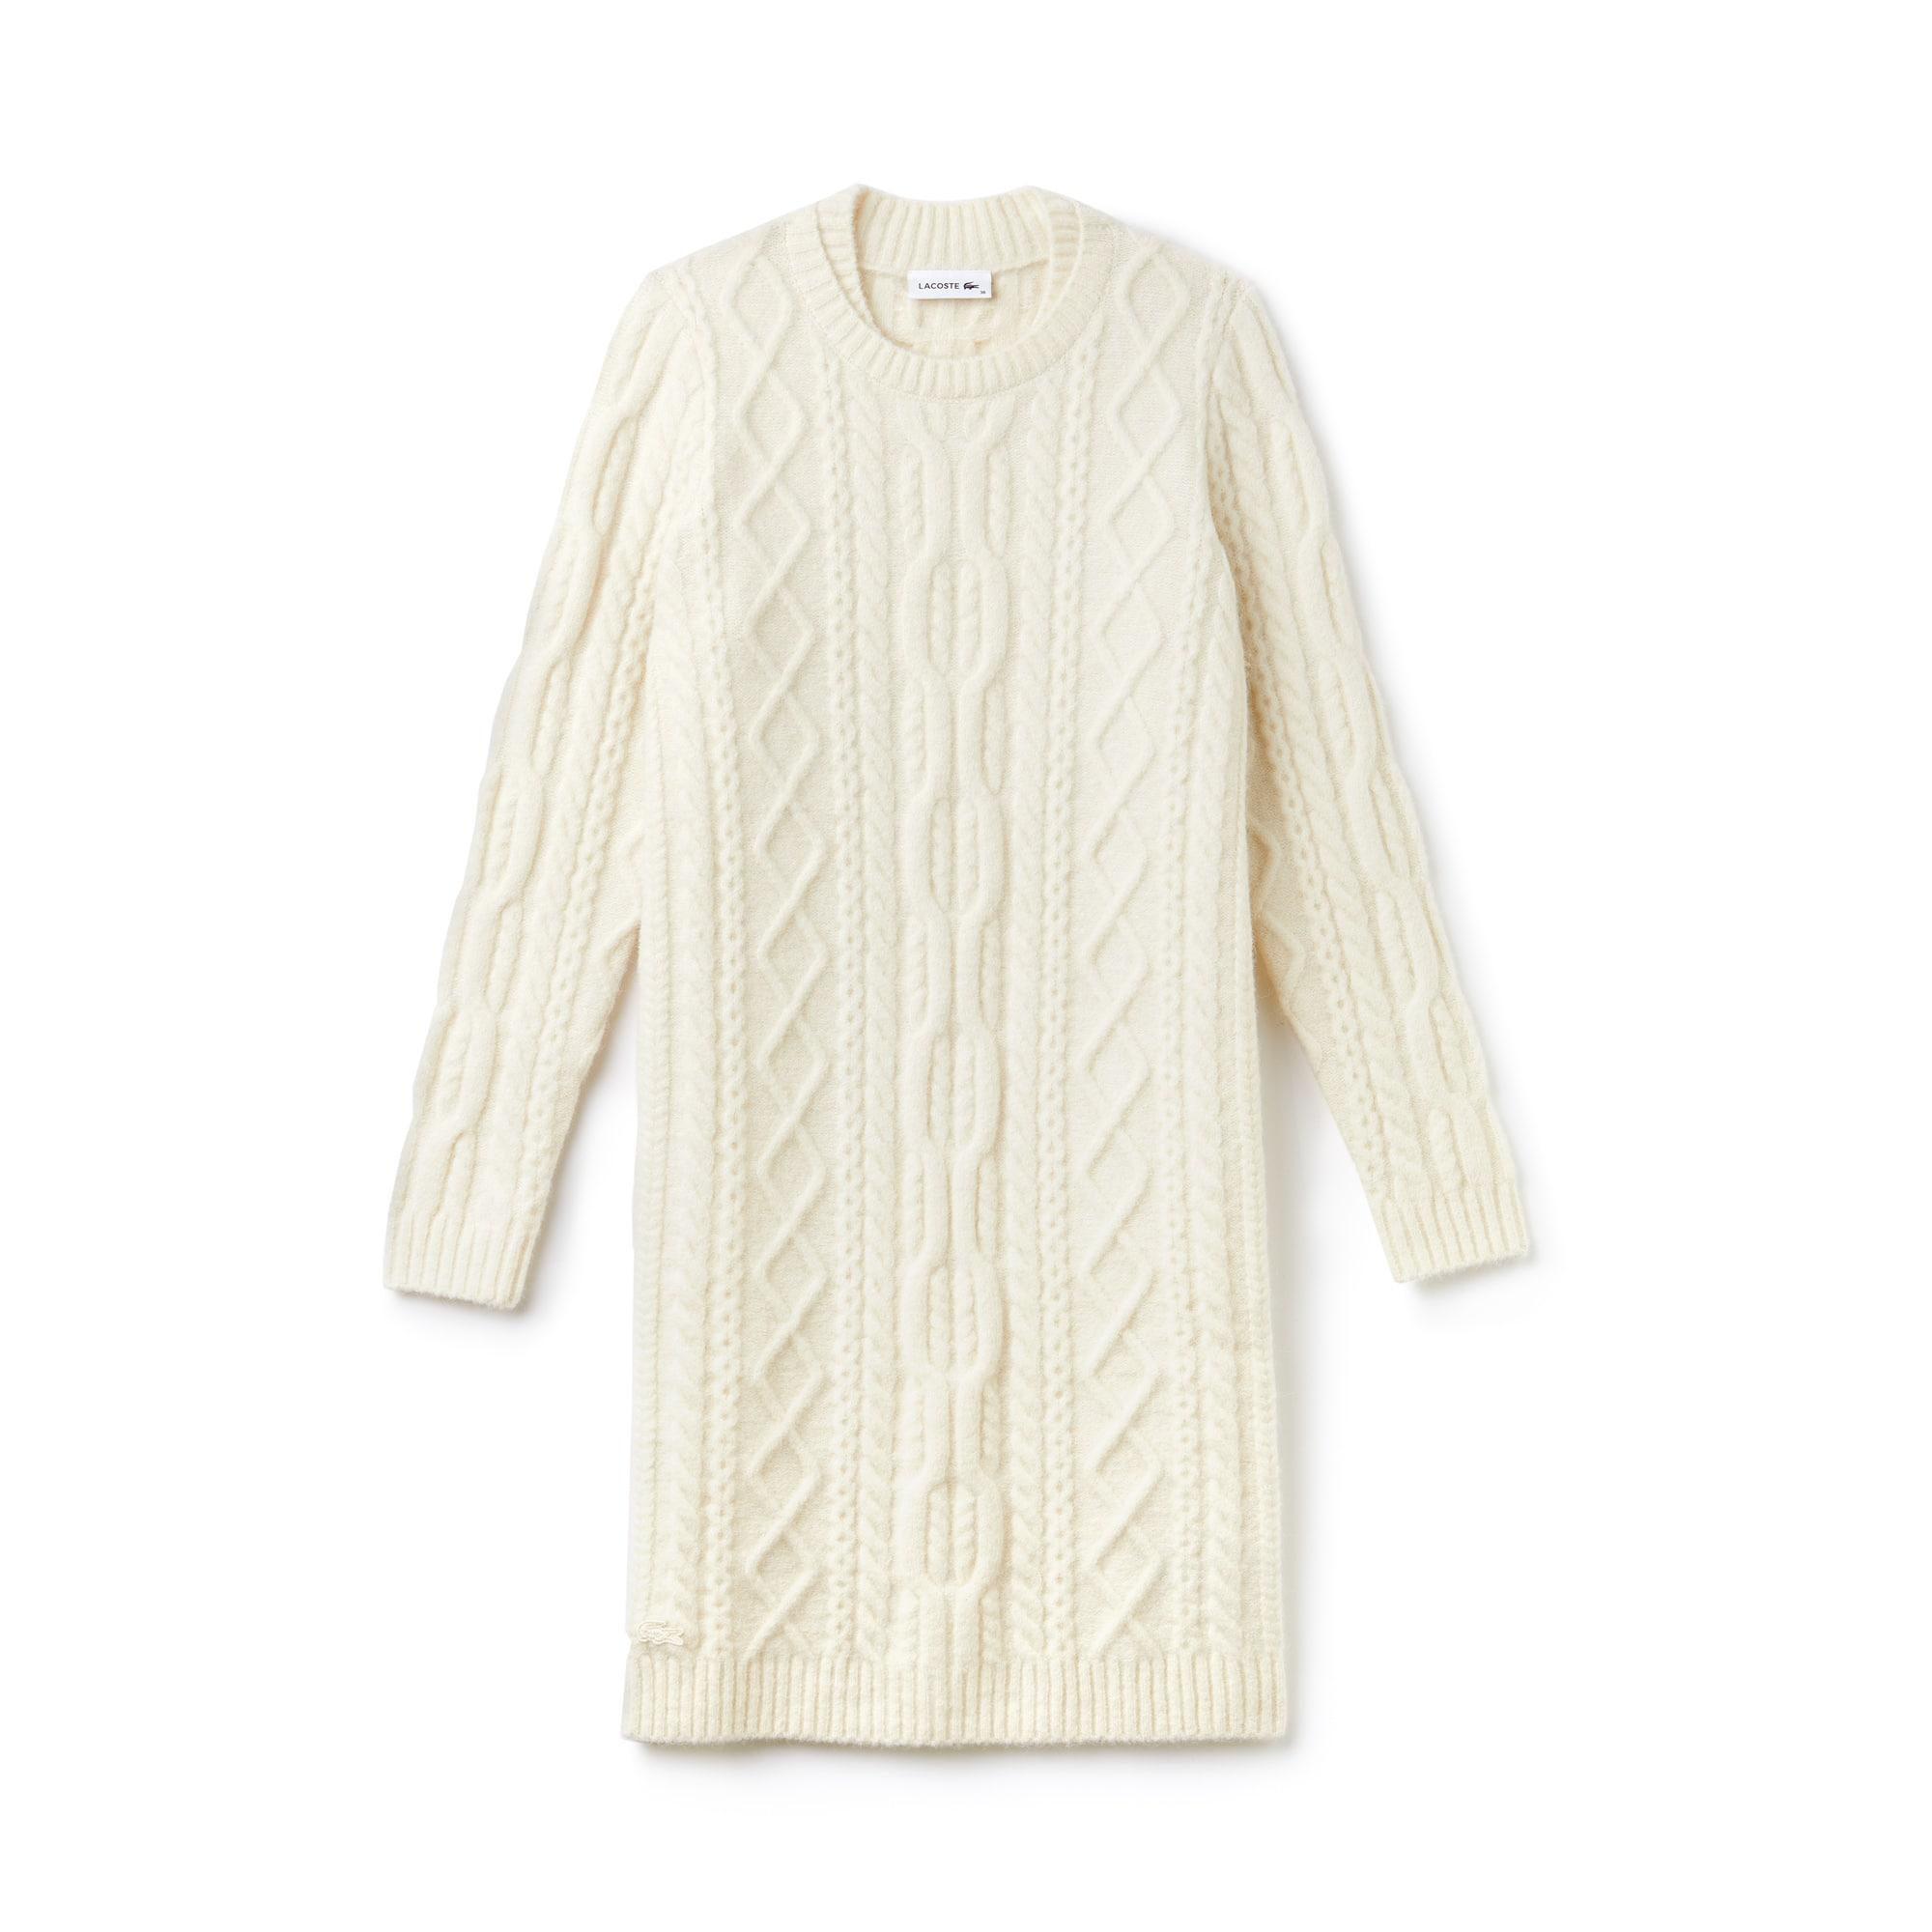 Women's Alpaga And Wool Cable Knit Sweater Dress